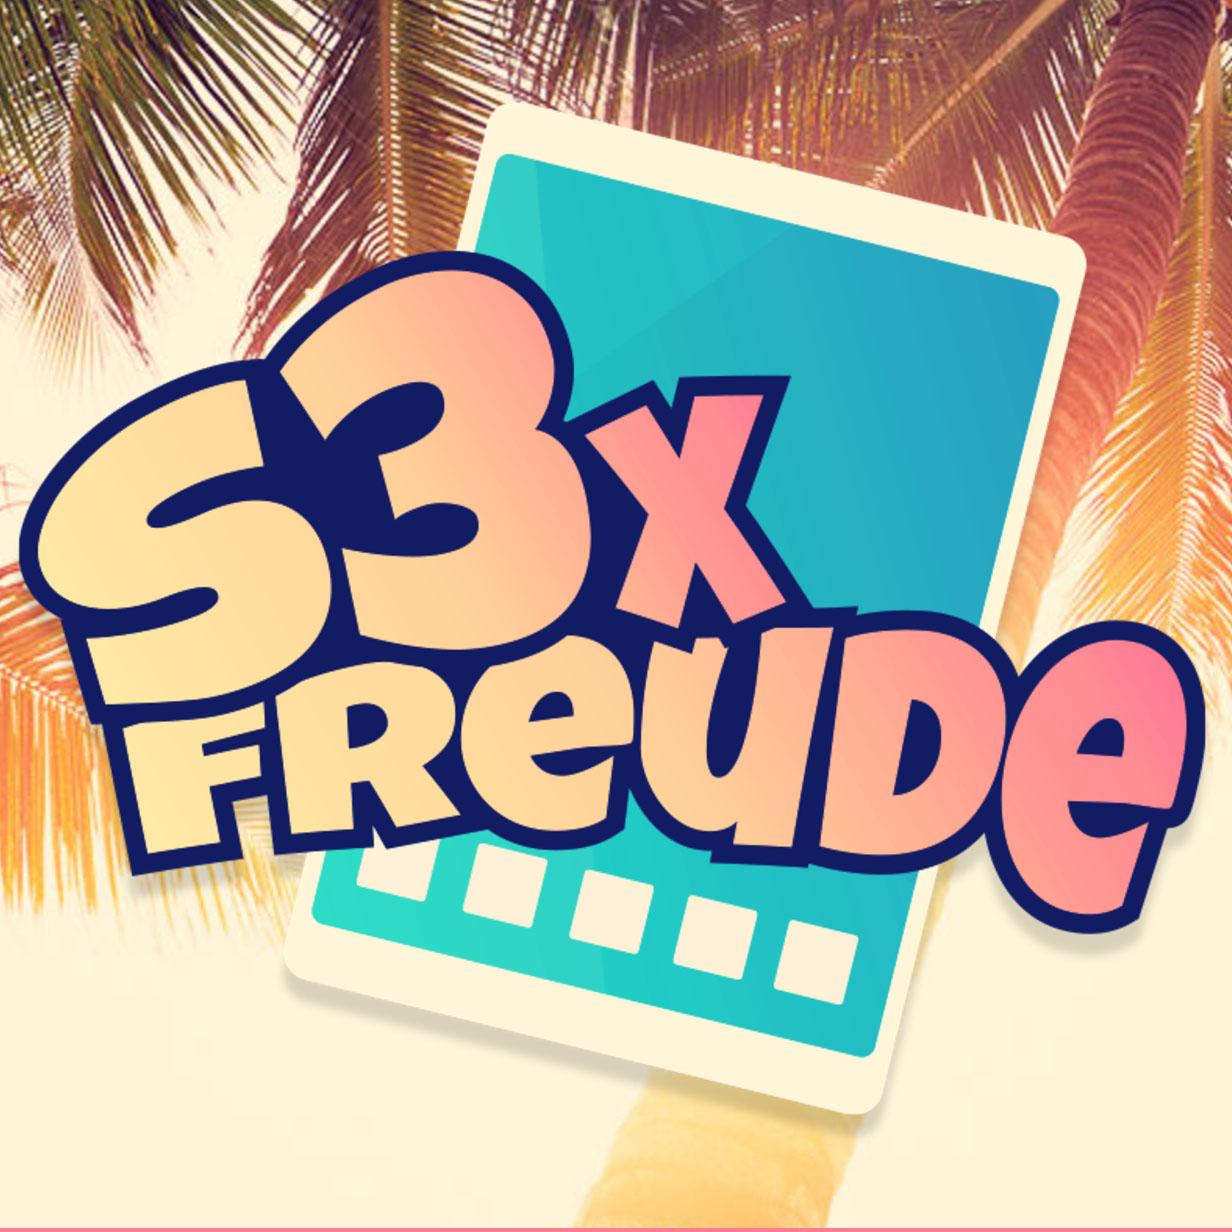 o2 Free mega Deal bei Sparhandy: 15 GB LTE (+ unbegrenzt UMTS) + Samsung Galaxy Tab S3 LTE + 120 € Cashback *UPDATE*